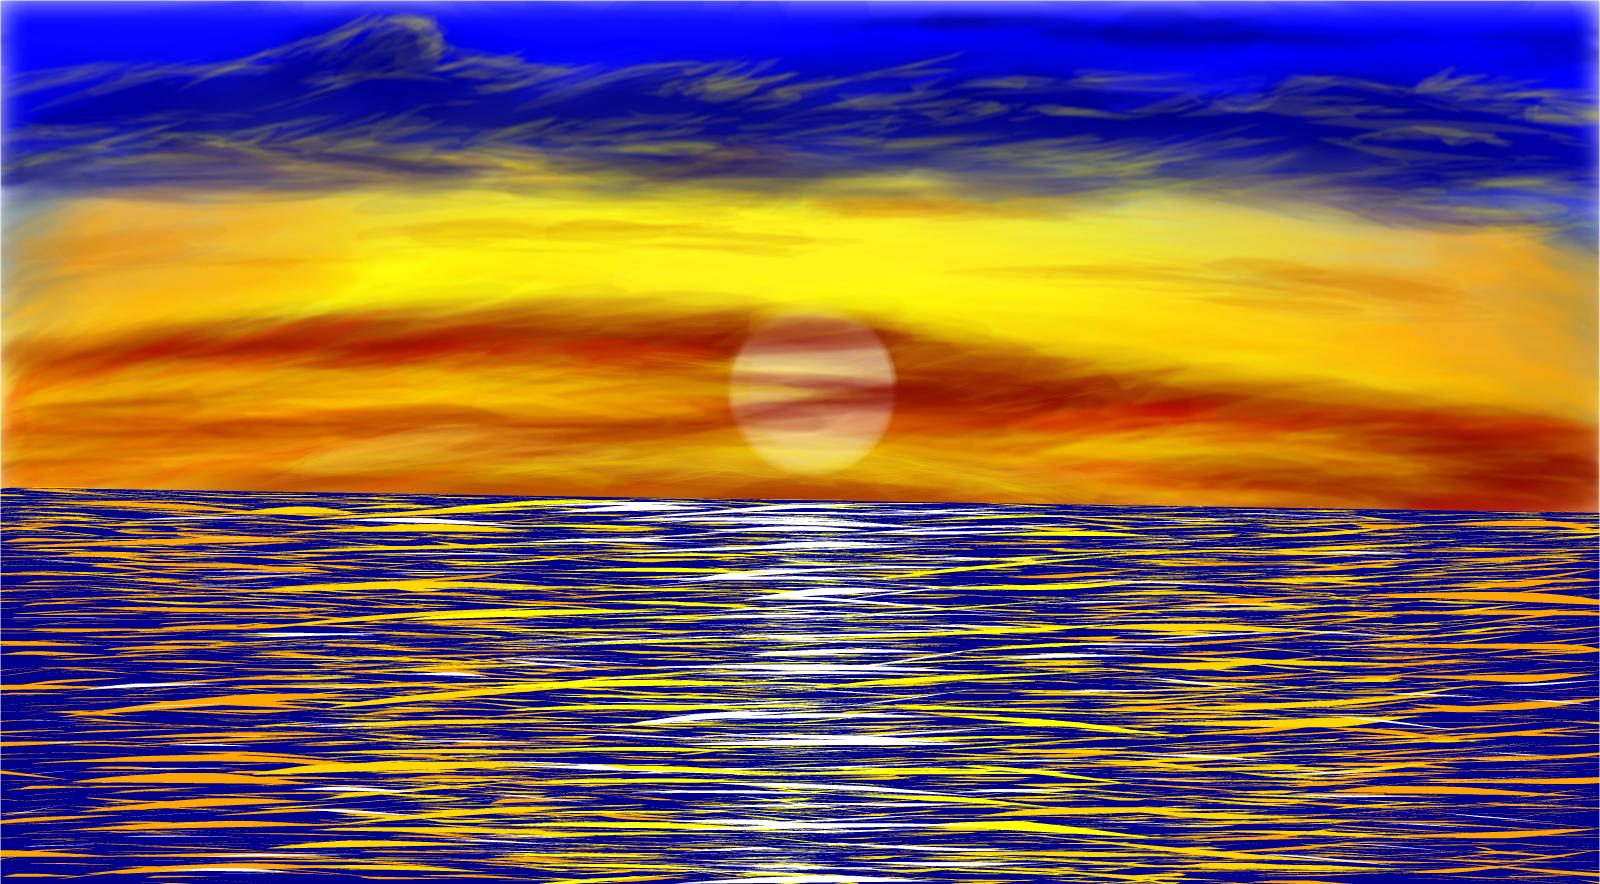 ocean sunset drawings sketchport